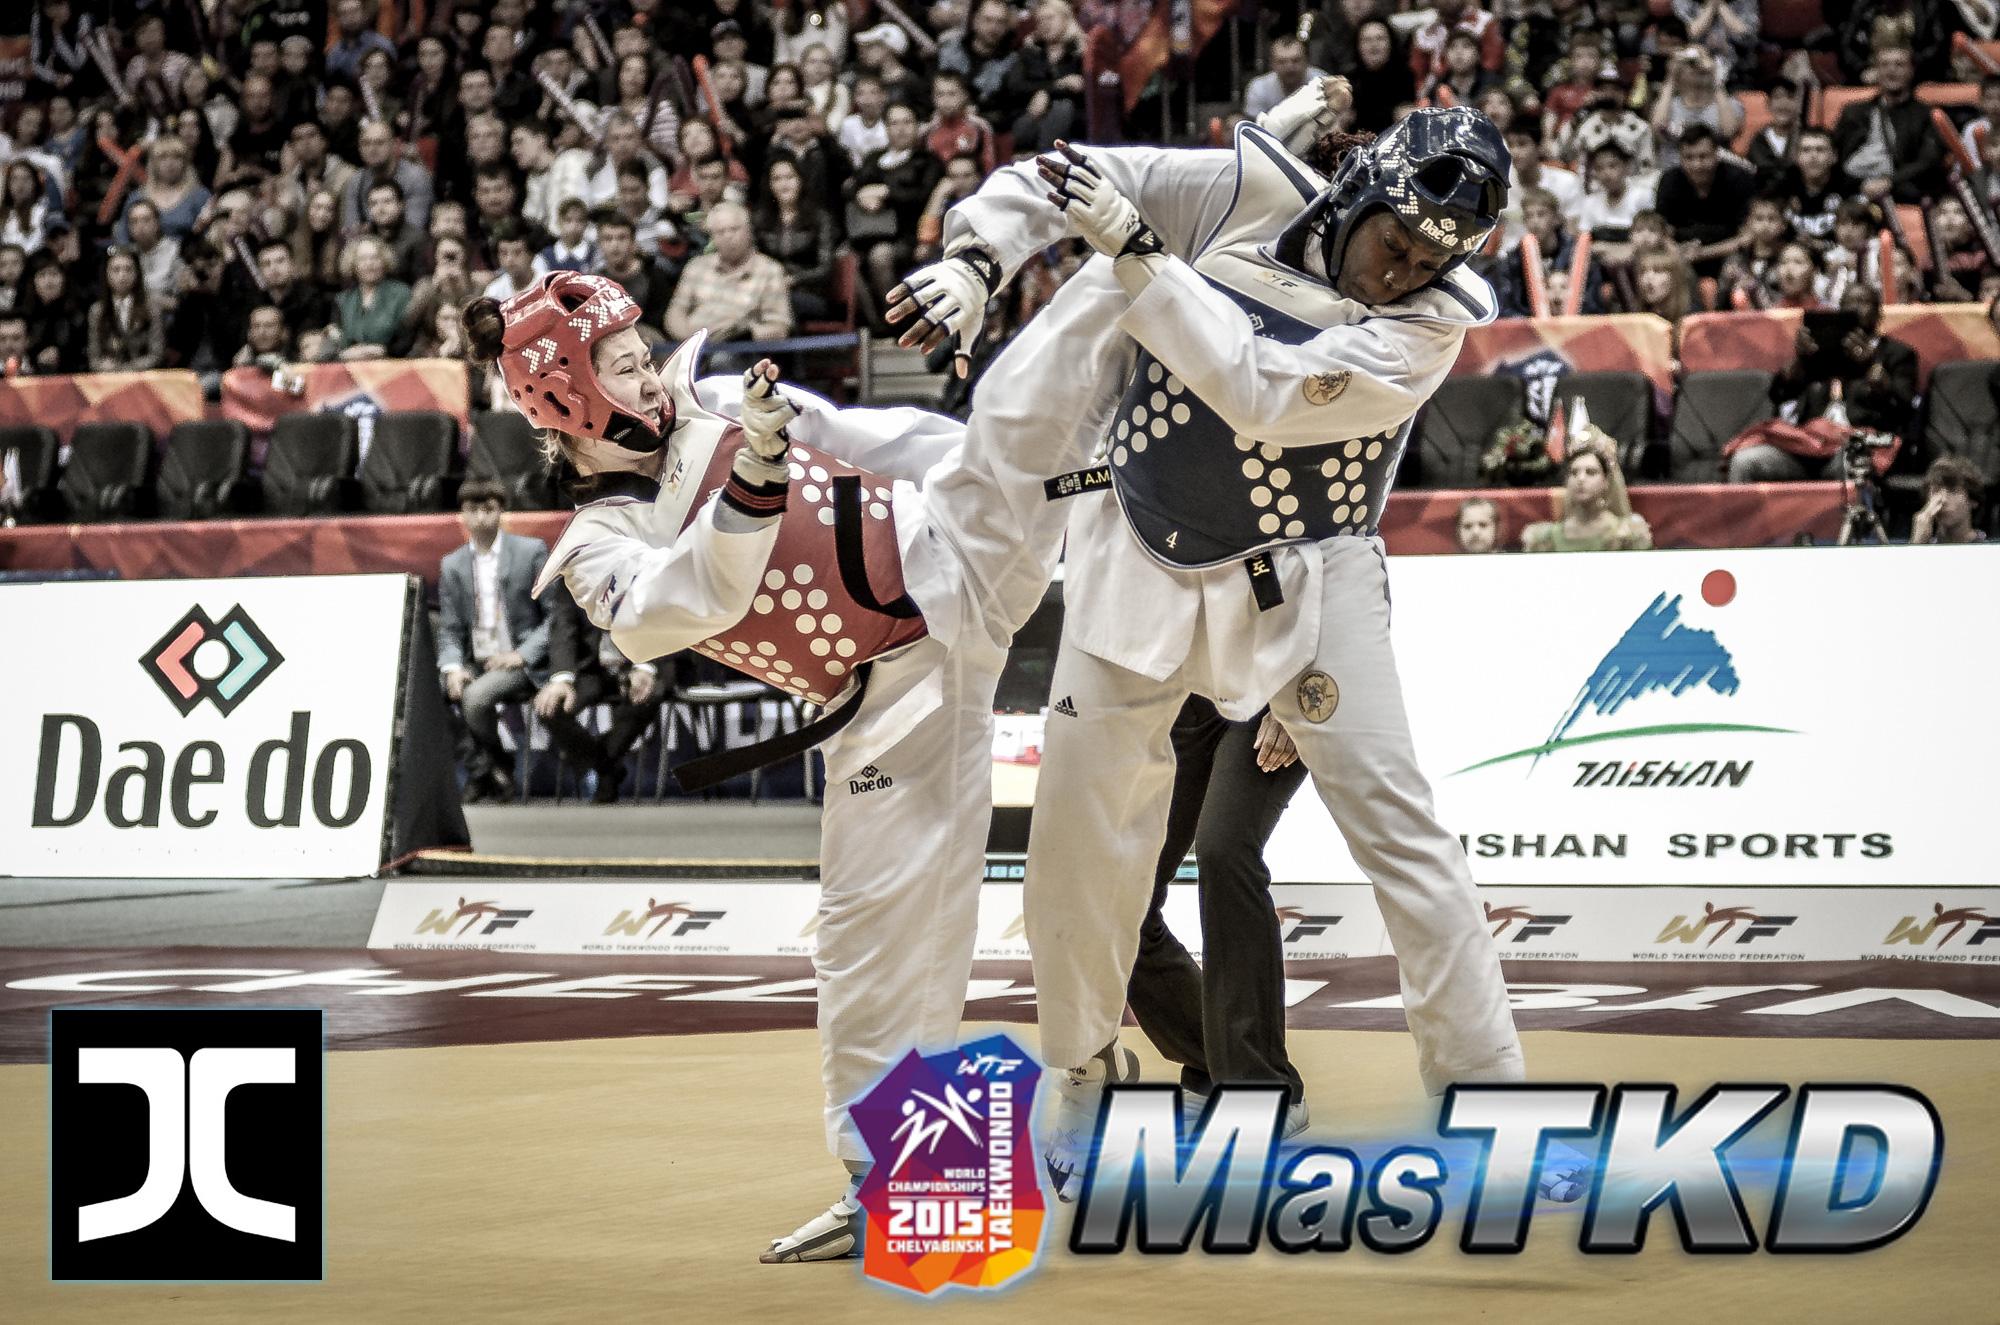 09_JCalicu-Mejores-imagenes-del-Mundial-de-Taekwondo_d5